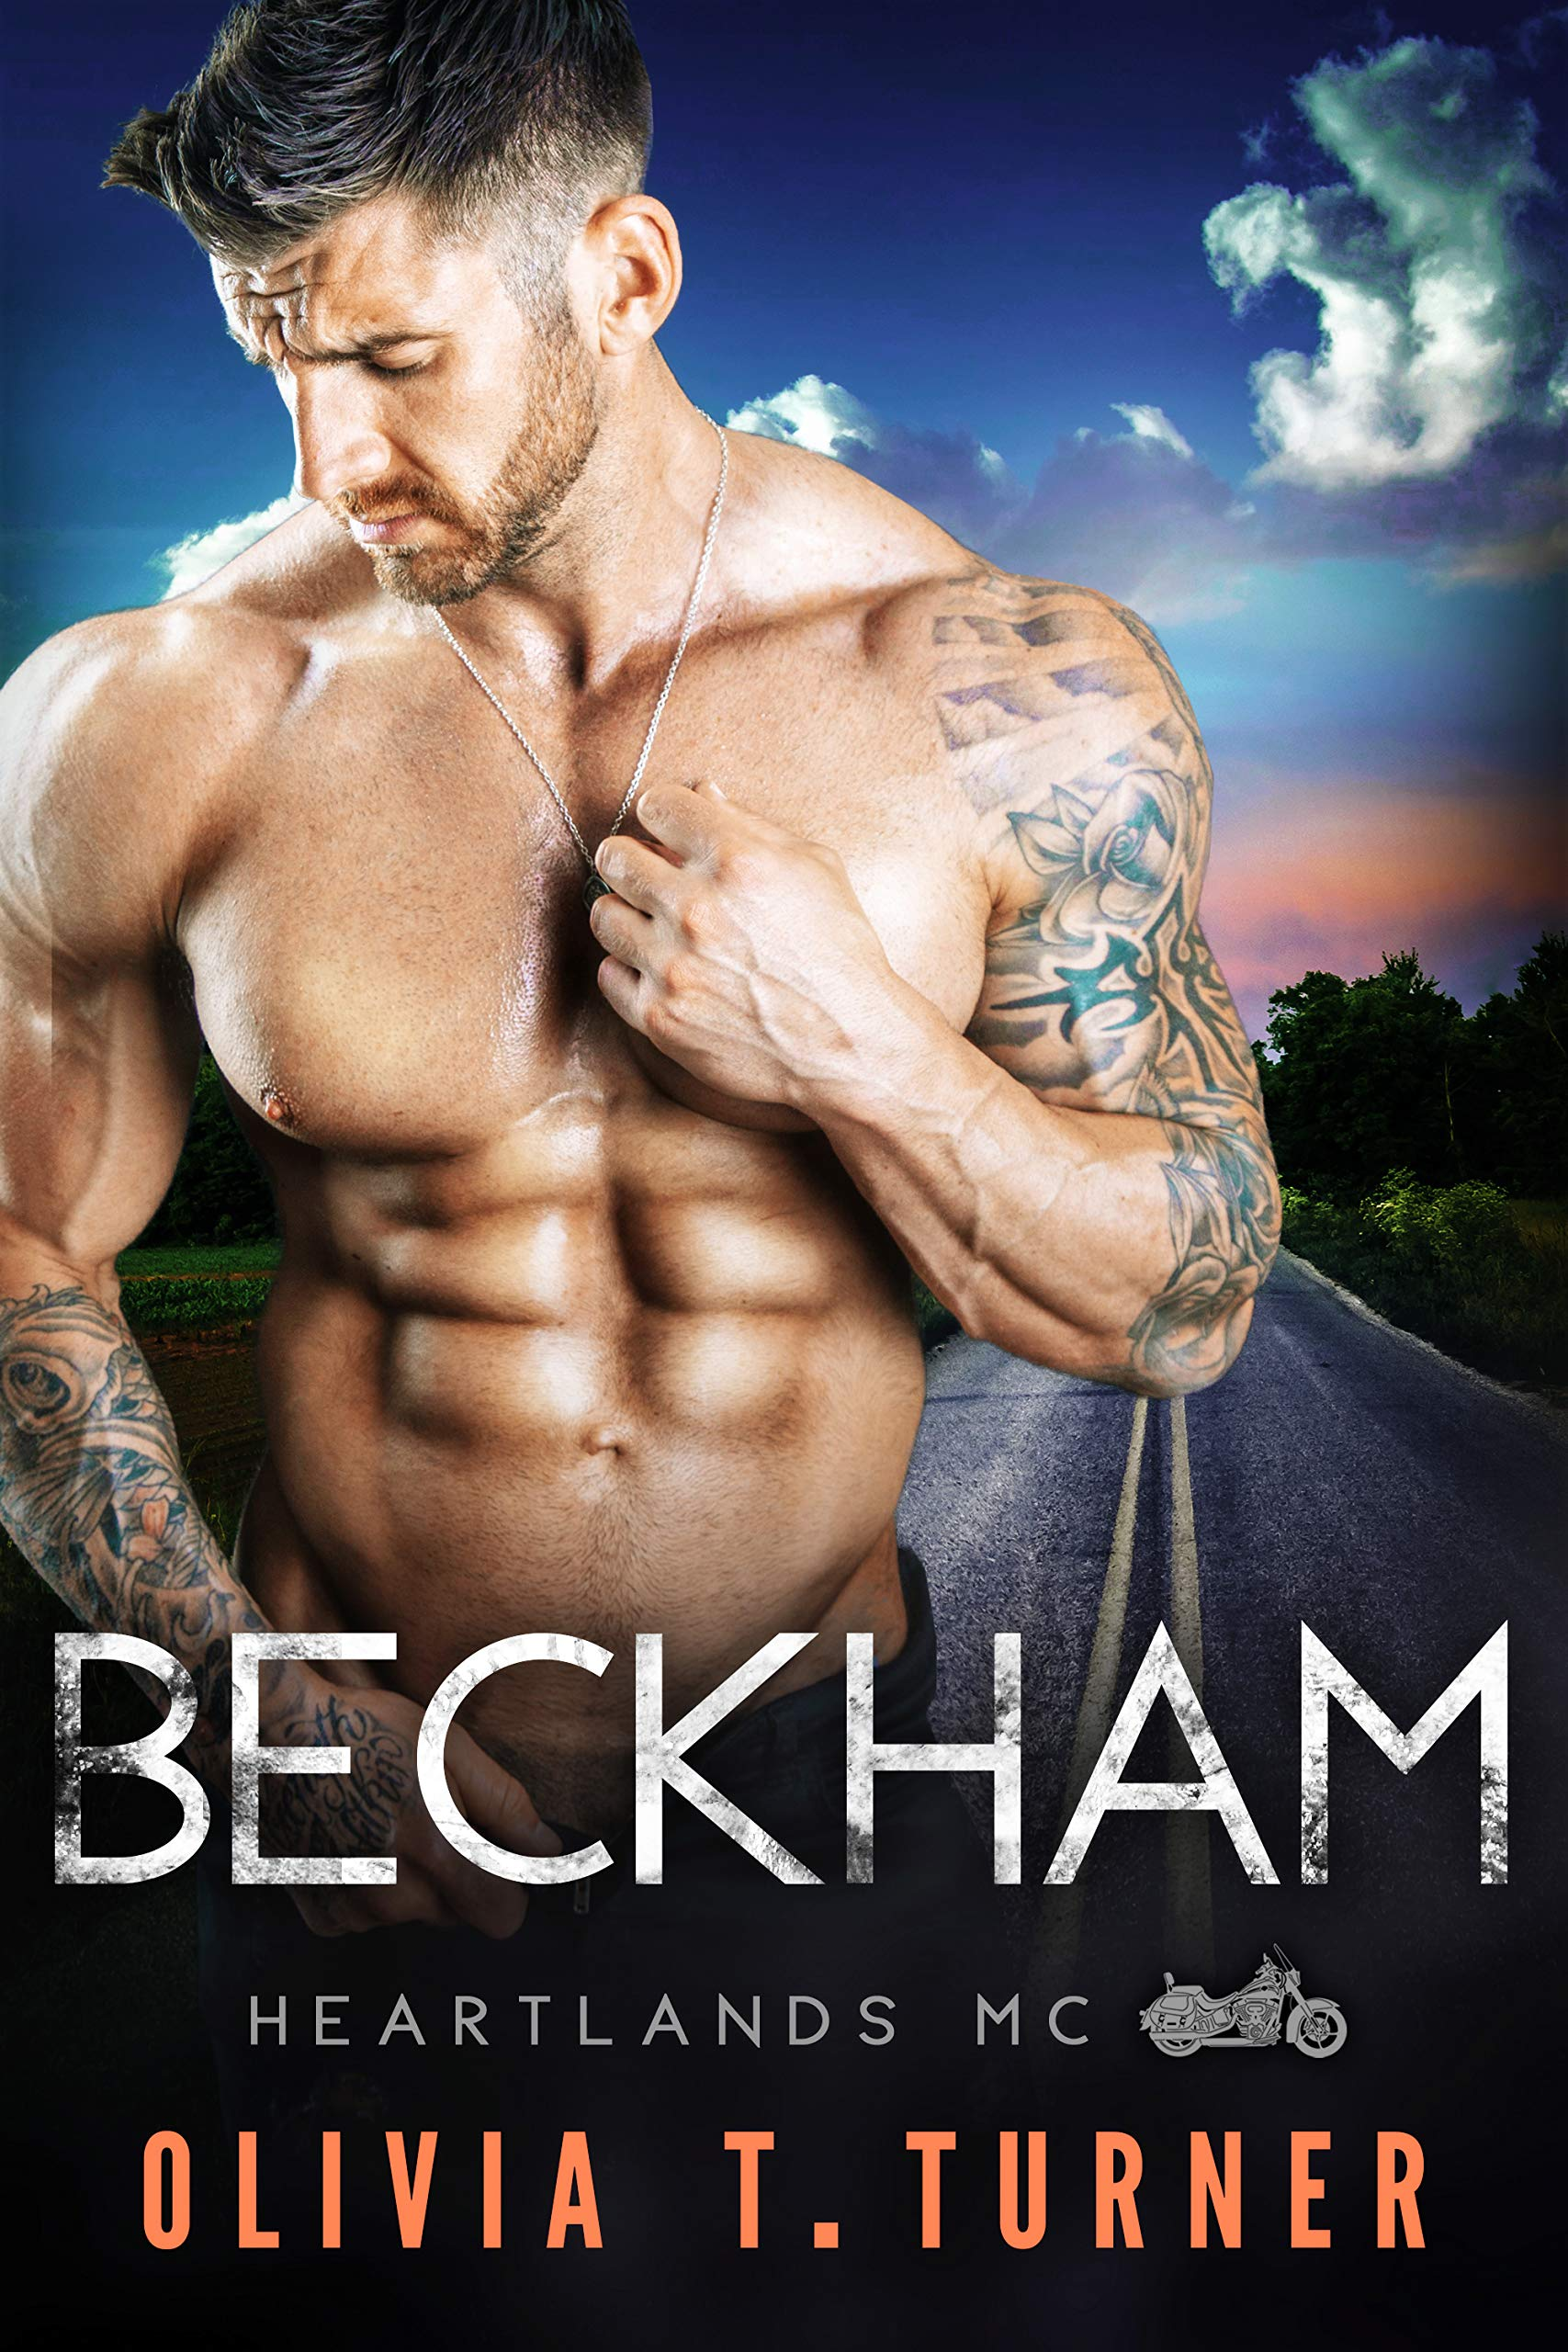 Beckham (Heartlands Motorcycle Club #10)